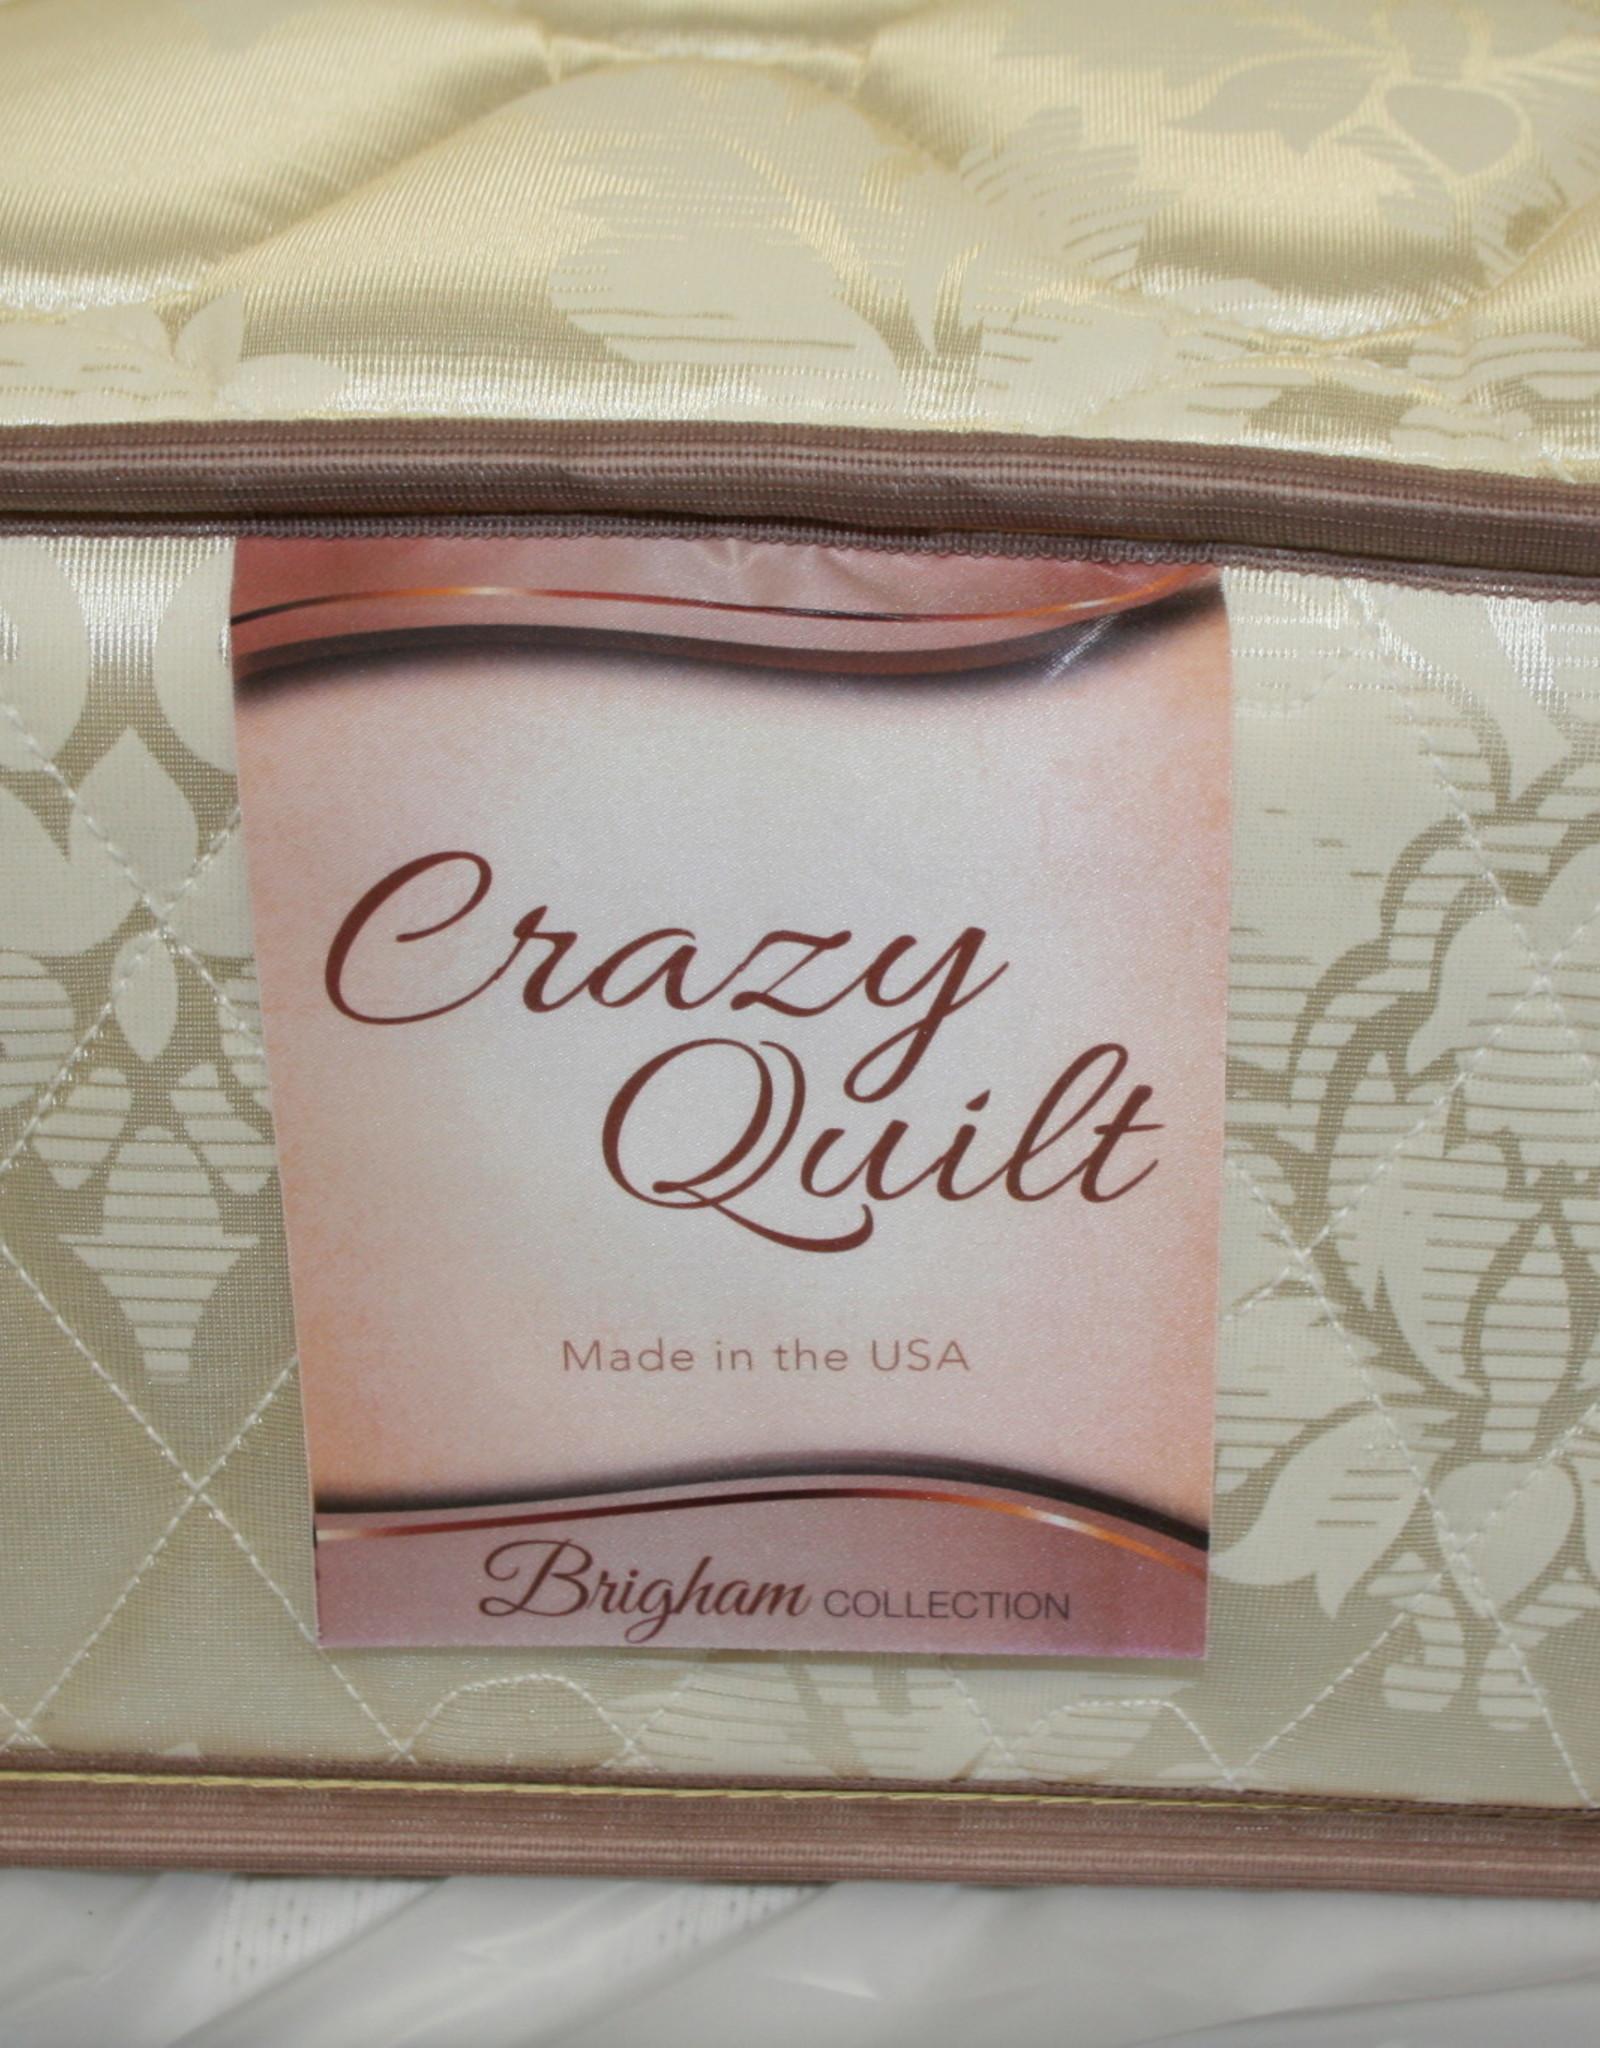 Corsicana Crazy Quilt Mattress Set